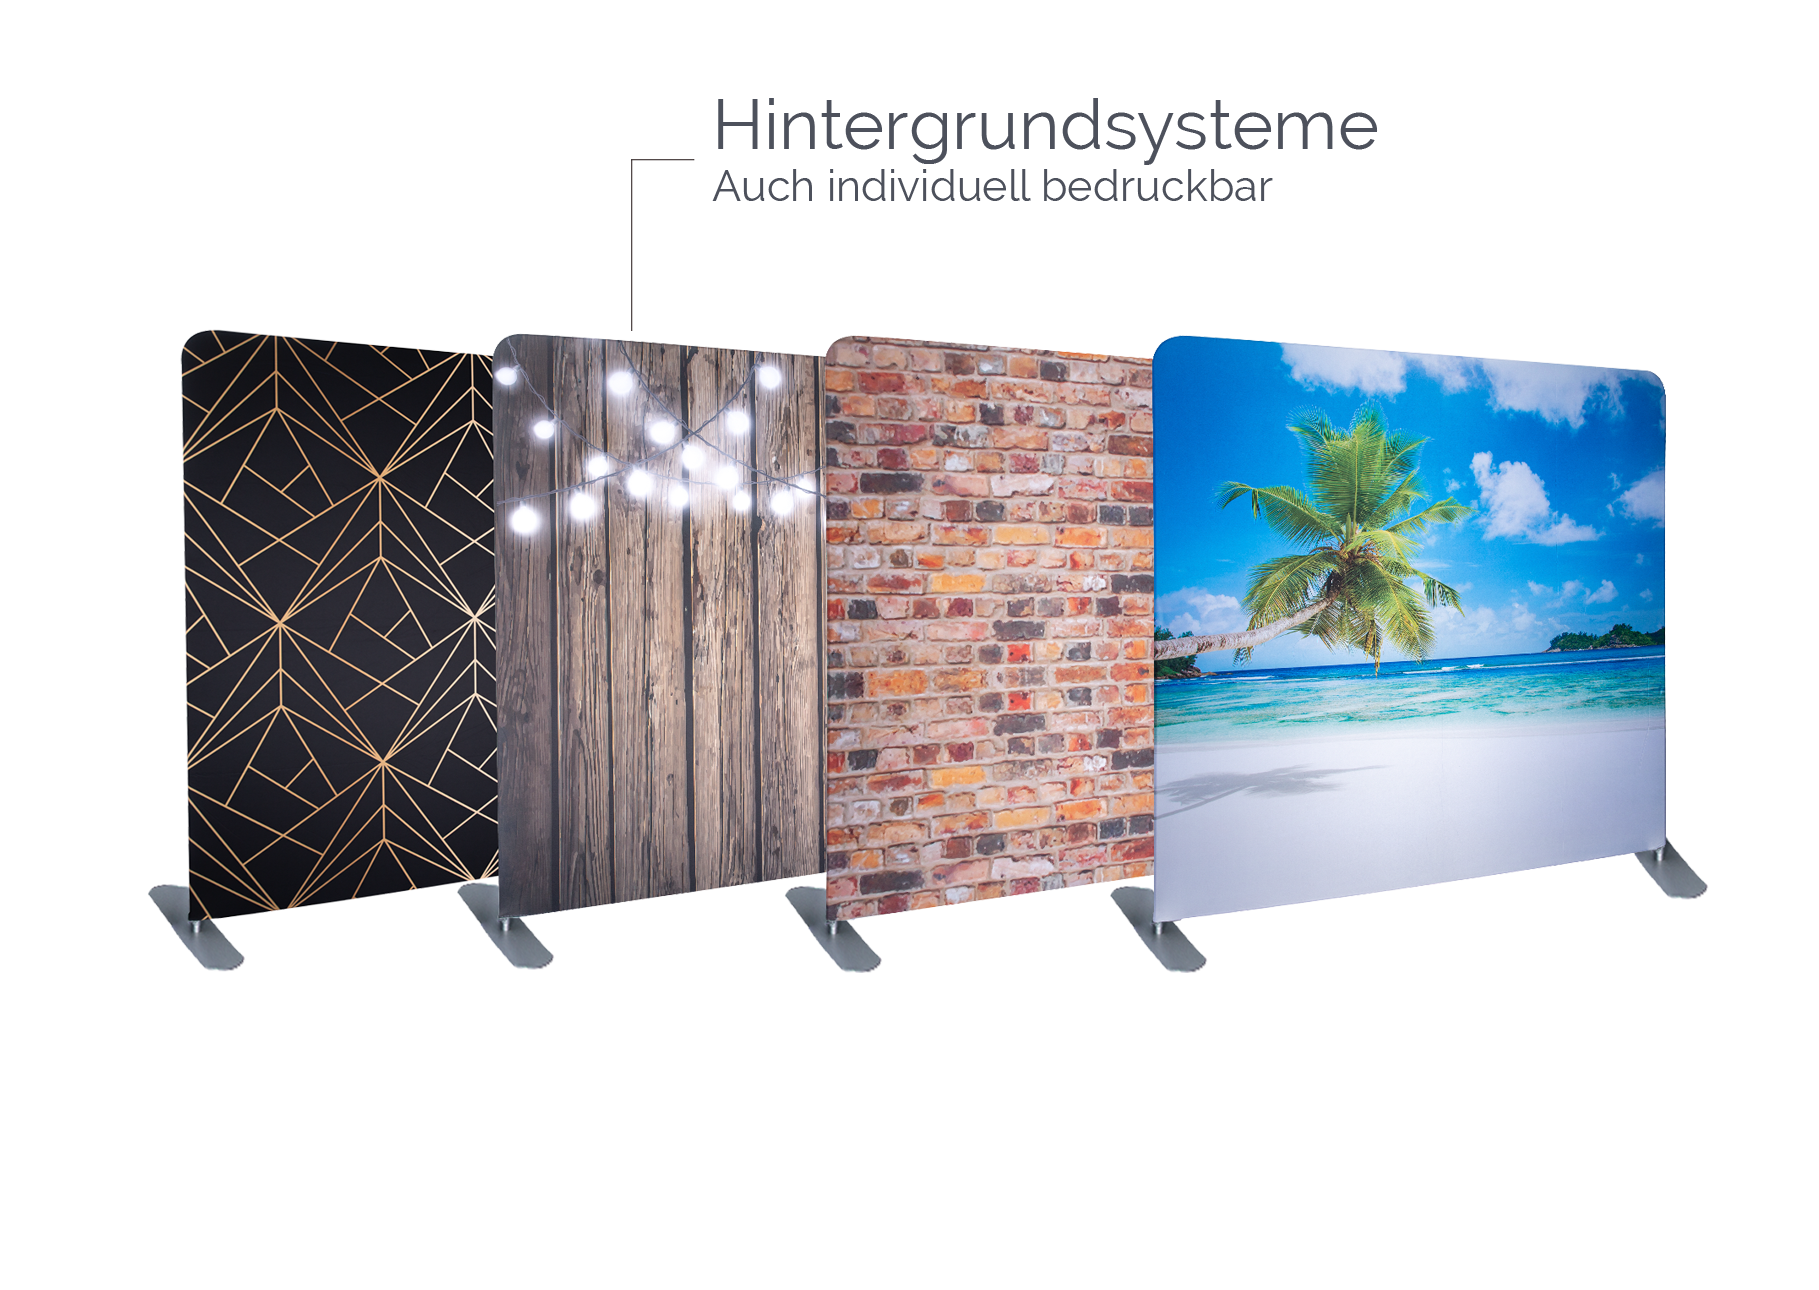 fotobox hintergrundsystem